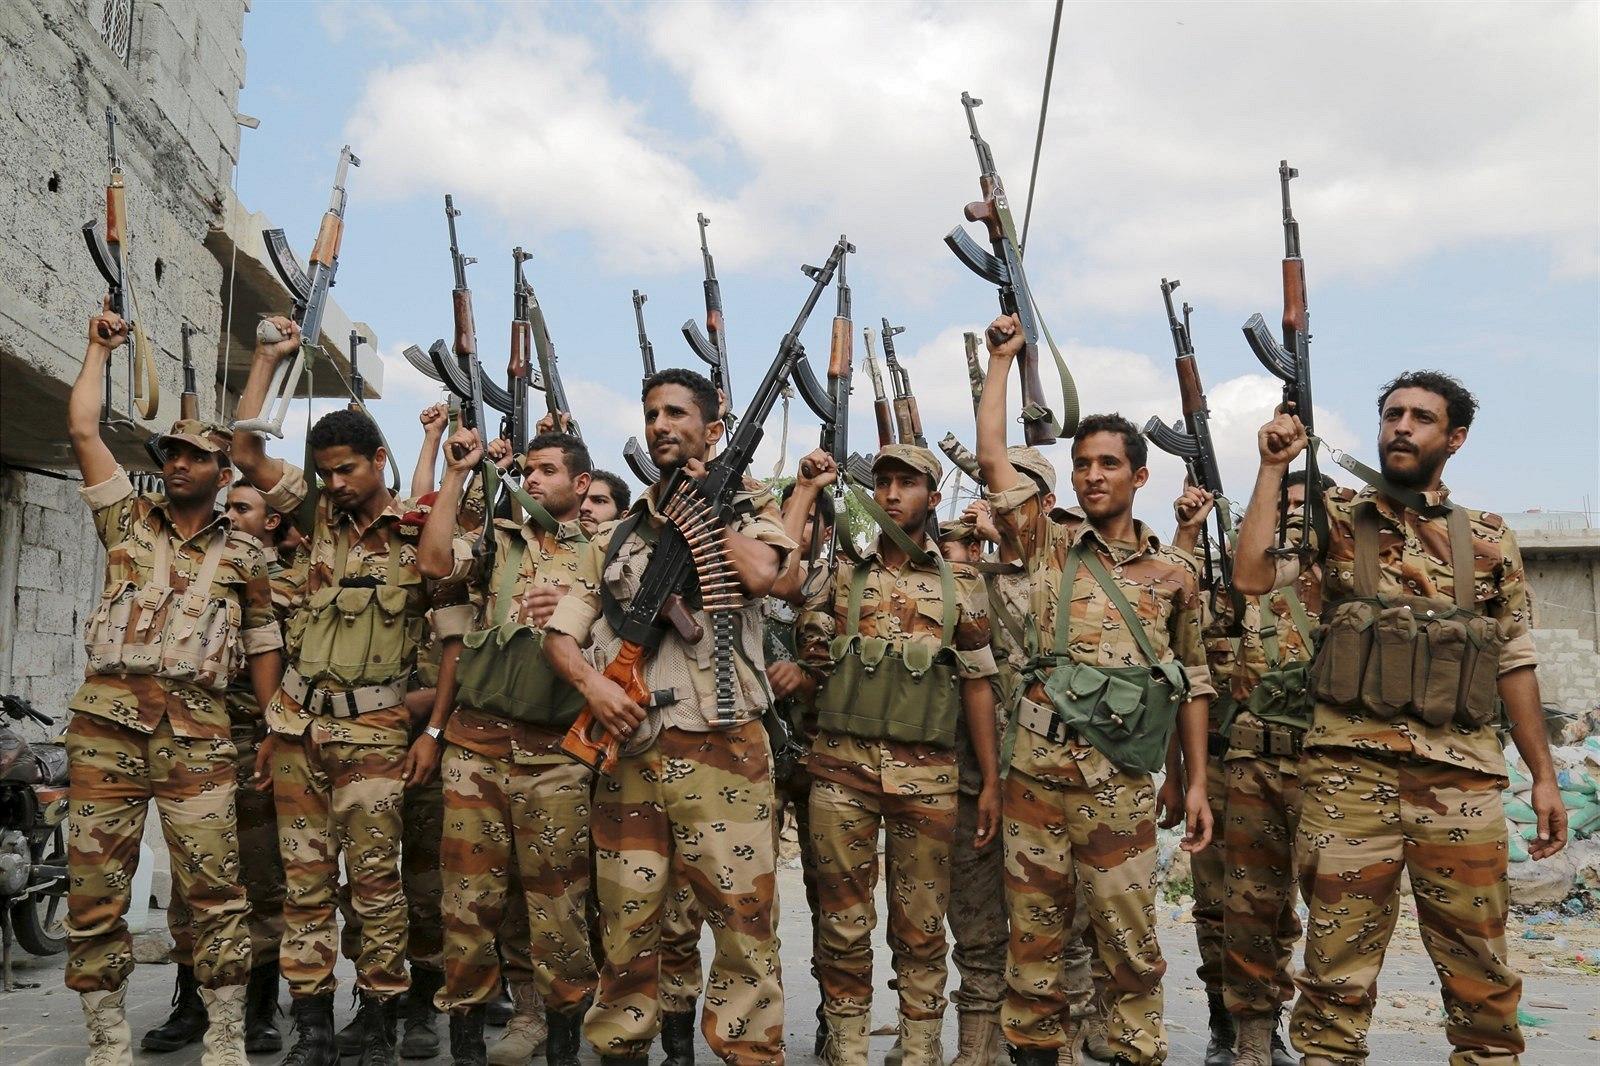 40 Pro-Hadi Militias Killed by Yemeni Forces in Hajjah Province